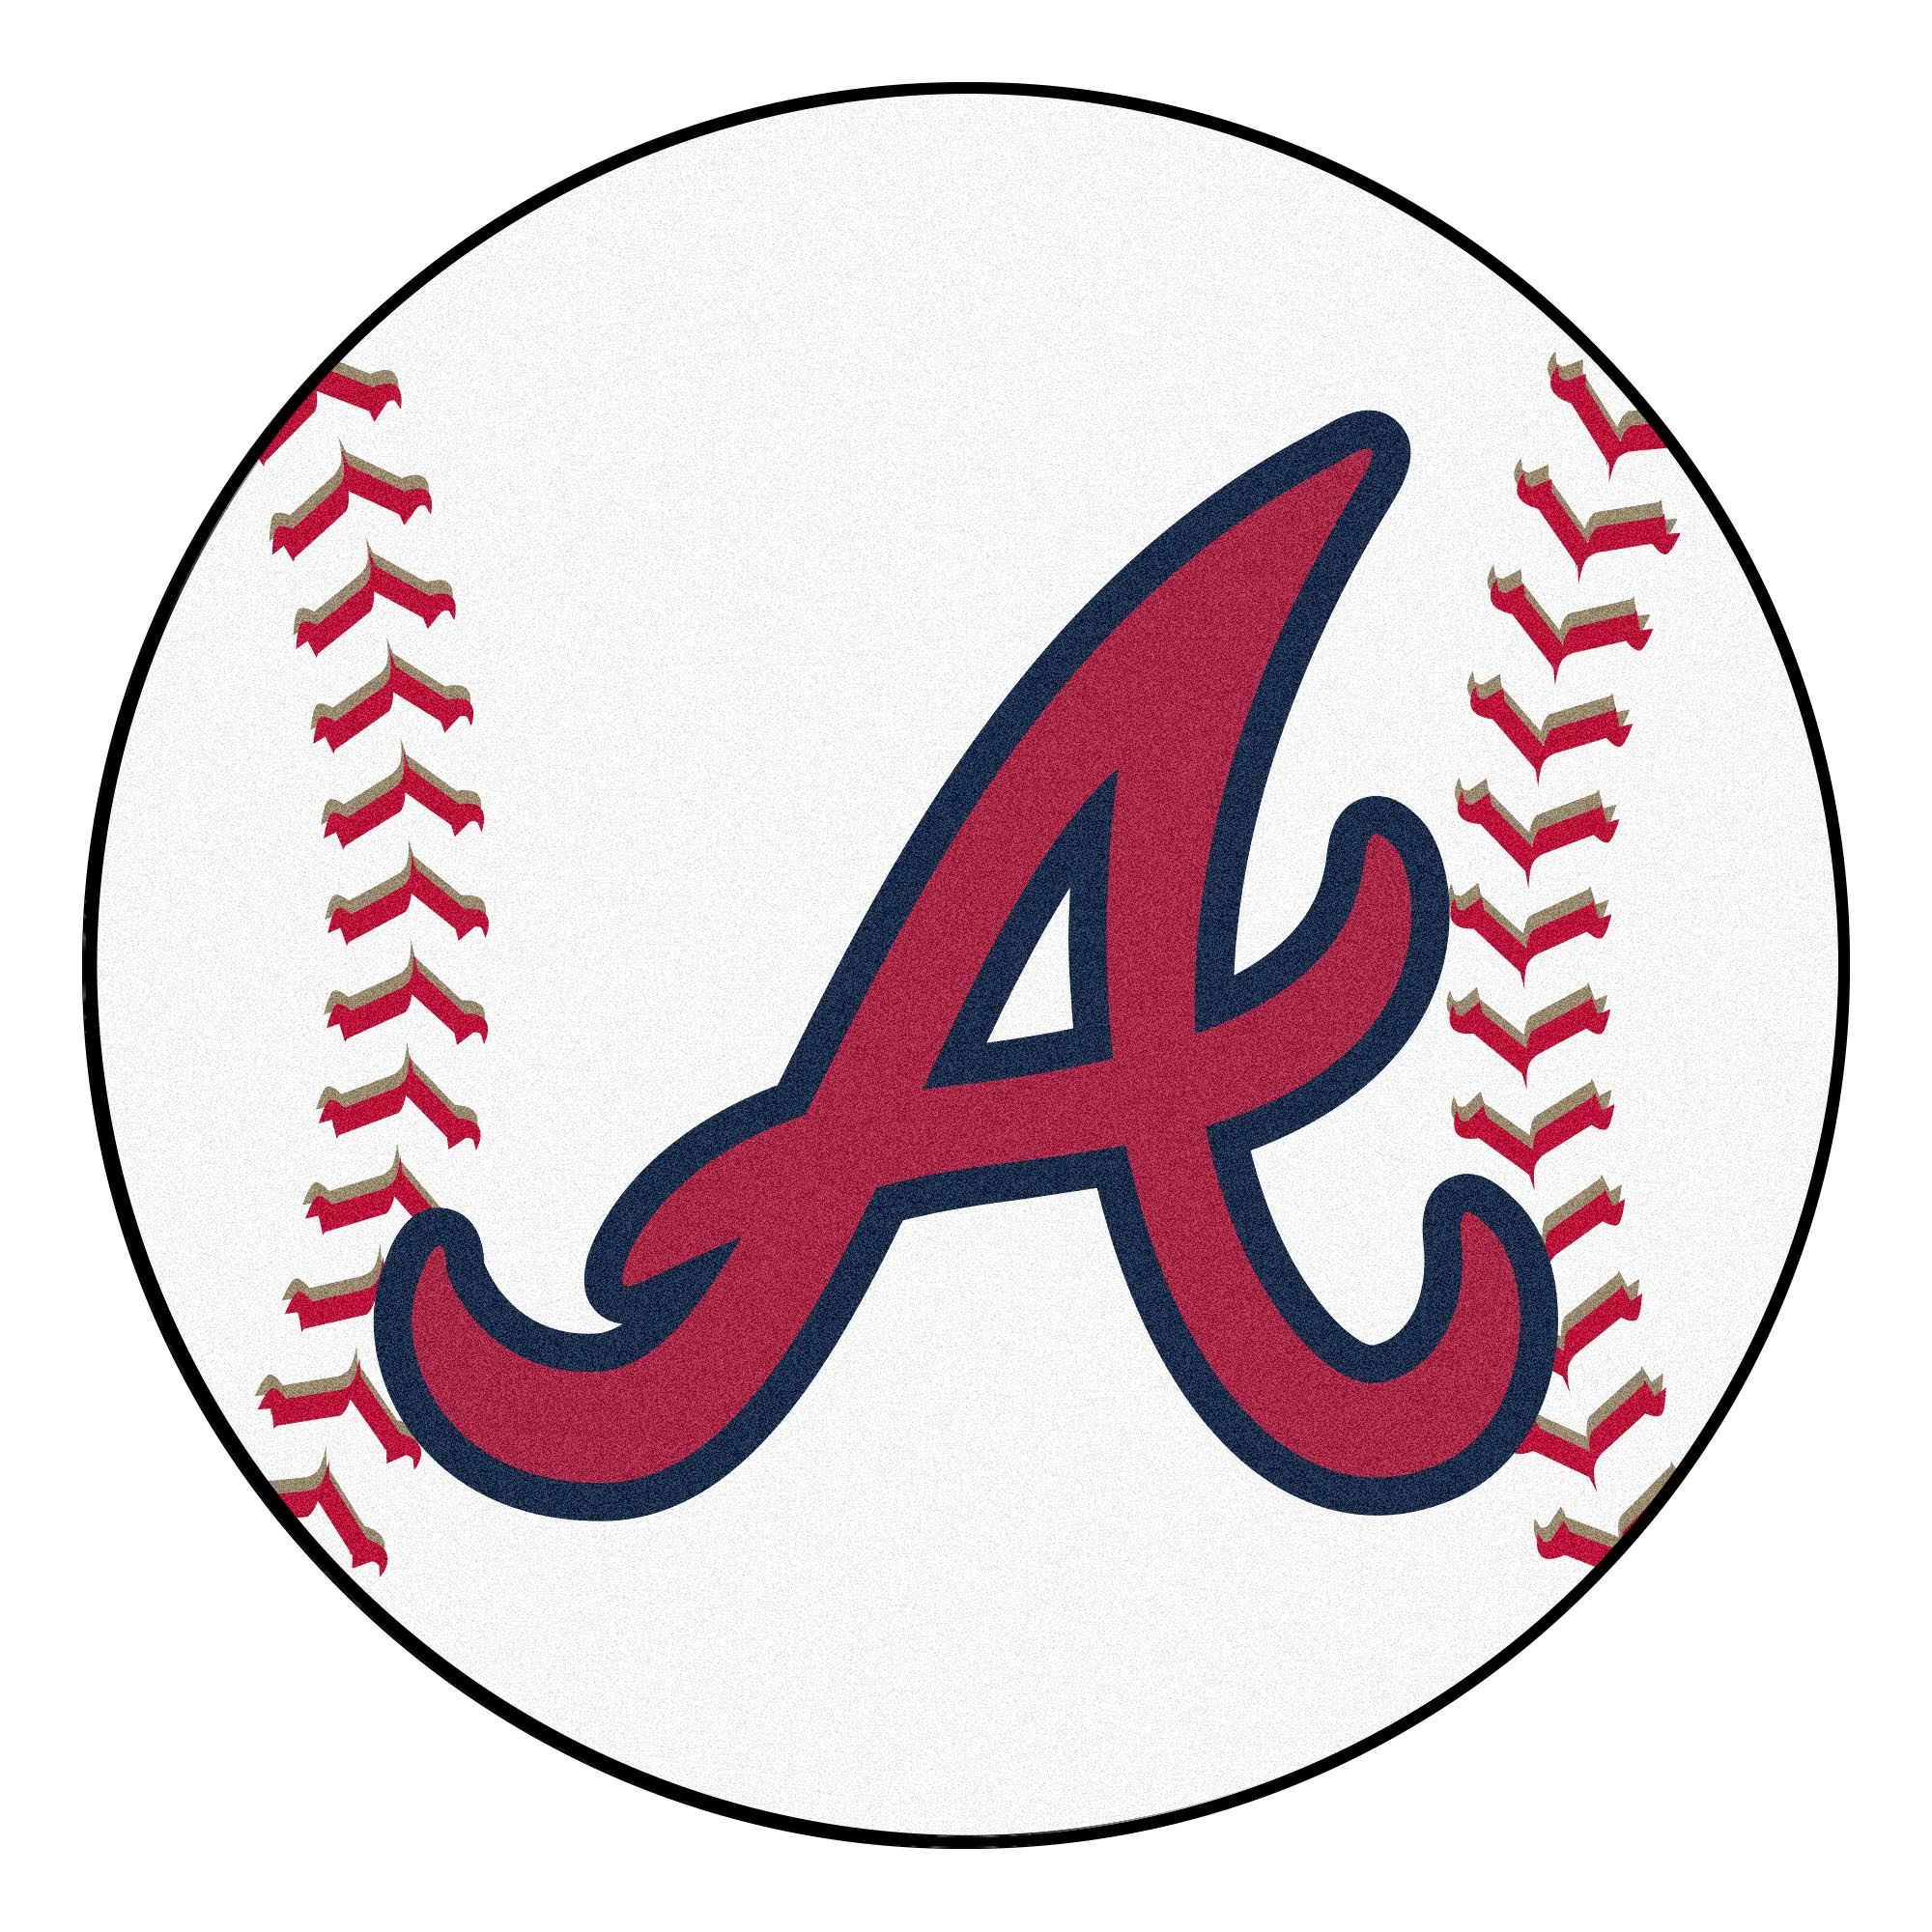 Mlb Atlanta Braves Baseball Shaped Mat Round Area Rug In 2020 Atlanta Braves Baseball Atlanta Braves Logo Braves Baseball